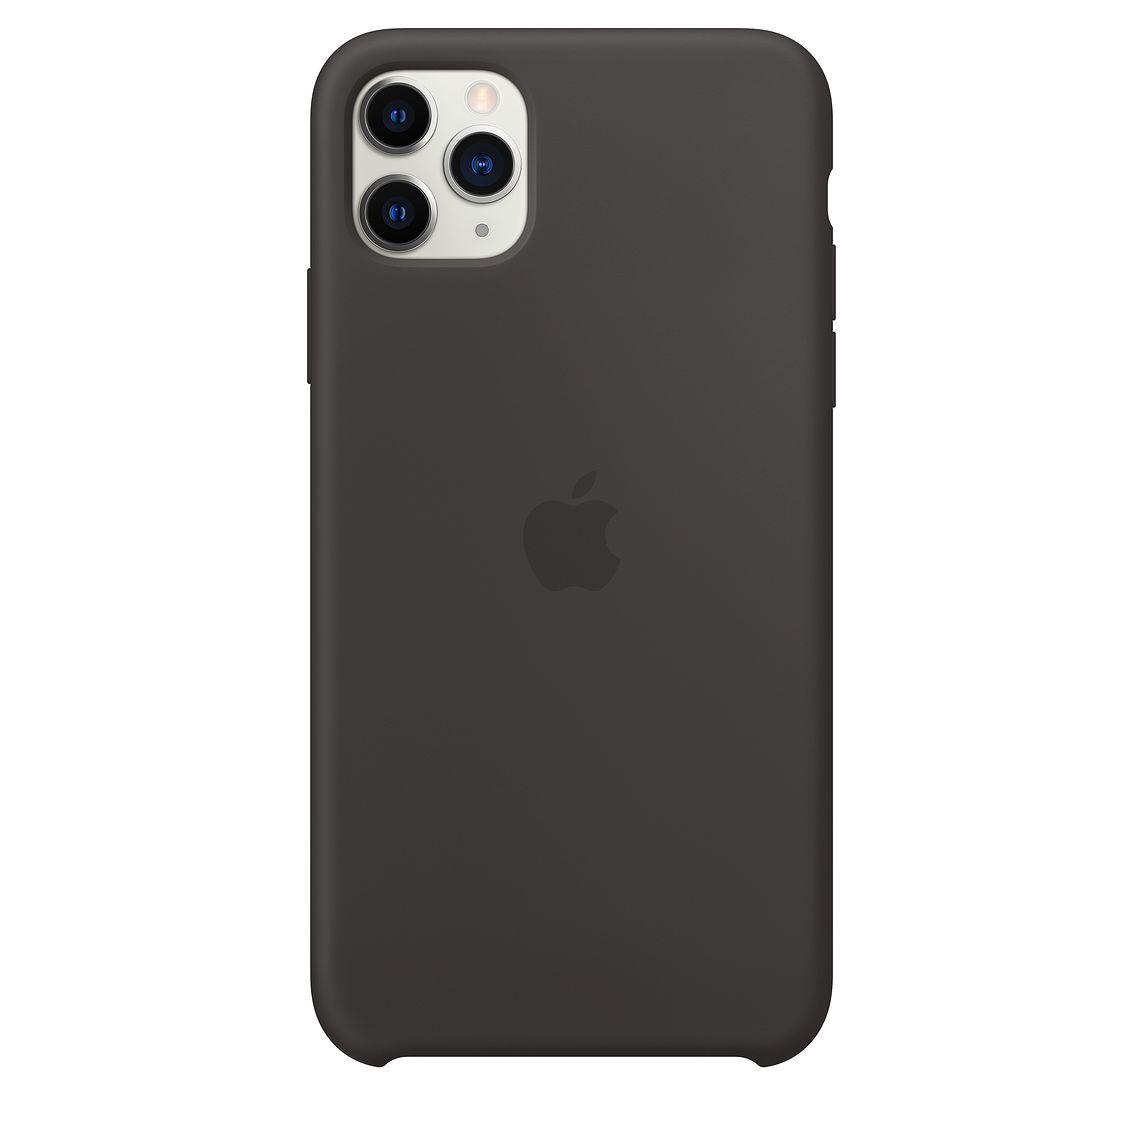 iPhone 11 Pro Silicone Case - Black  - 1